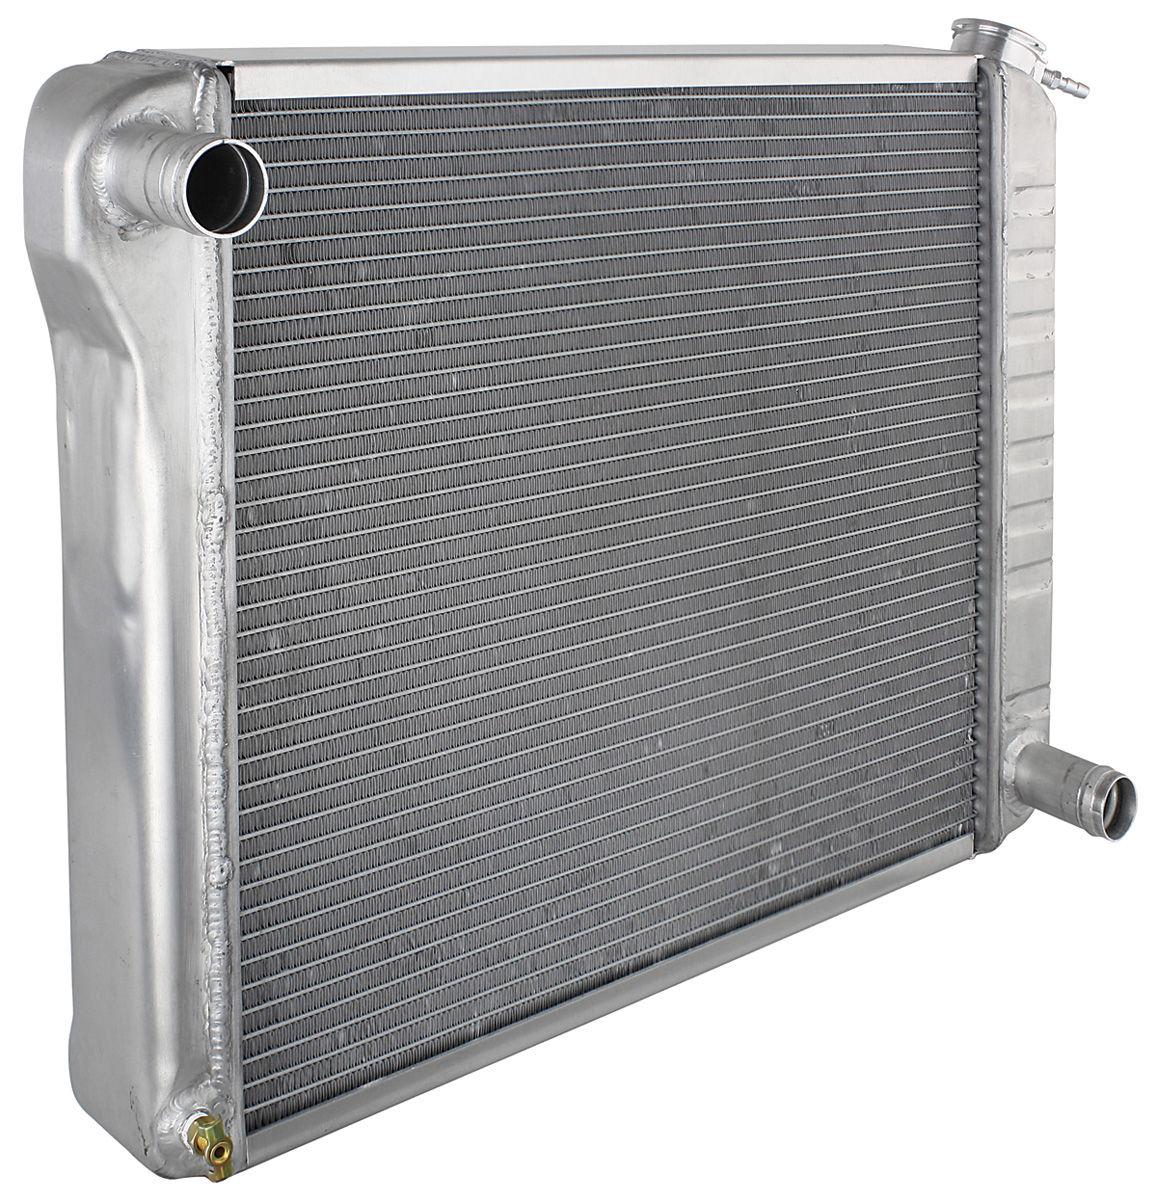 Radiator, 1968-77 Chevrolet, BOP, Aluminum, MT, Satin